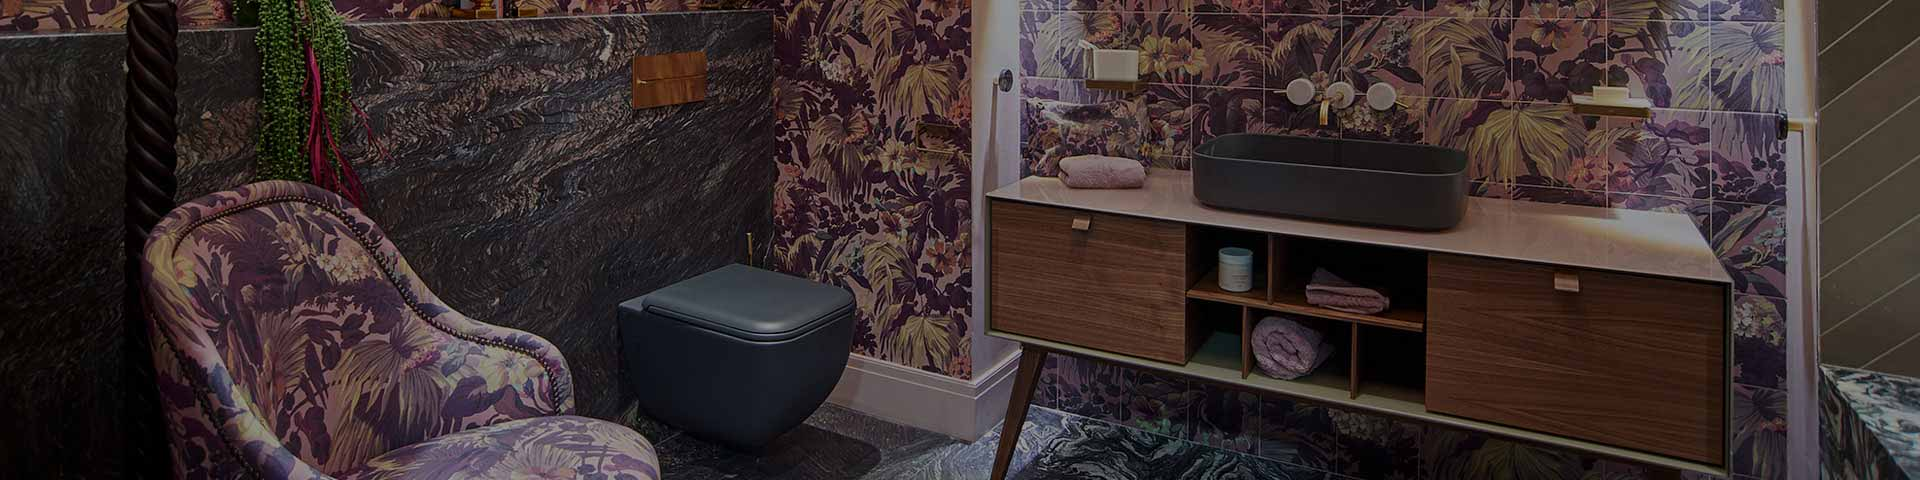 bathroom design ideas your bathroom reimagined